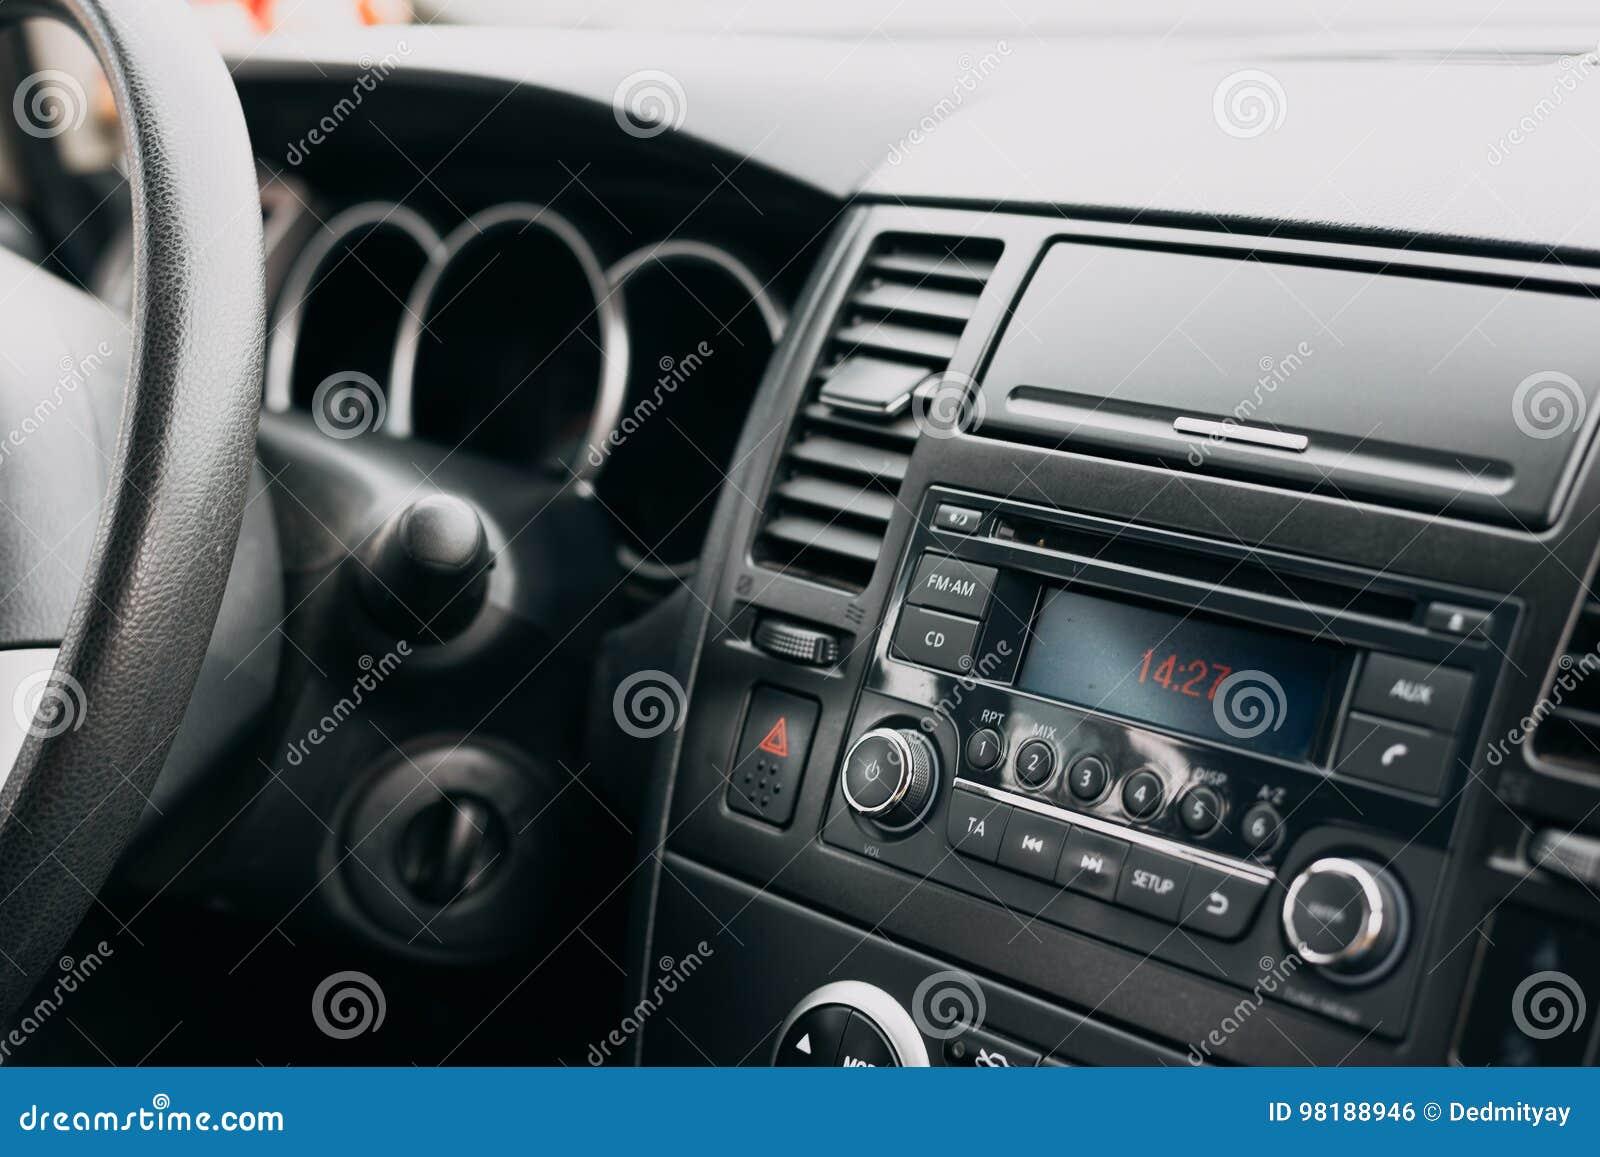 Autoinnenraum, Bedienfeld, Armaturenbrett, Radiosystem